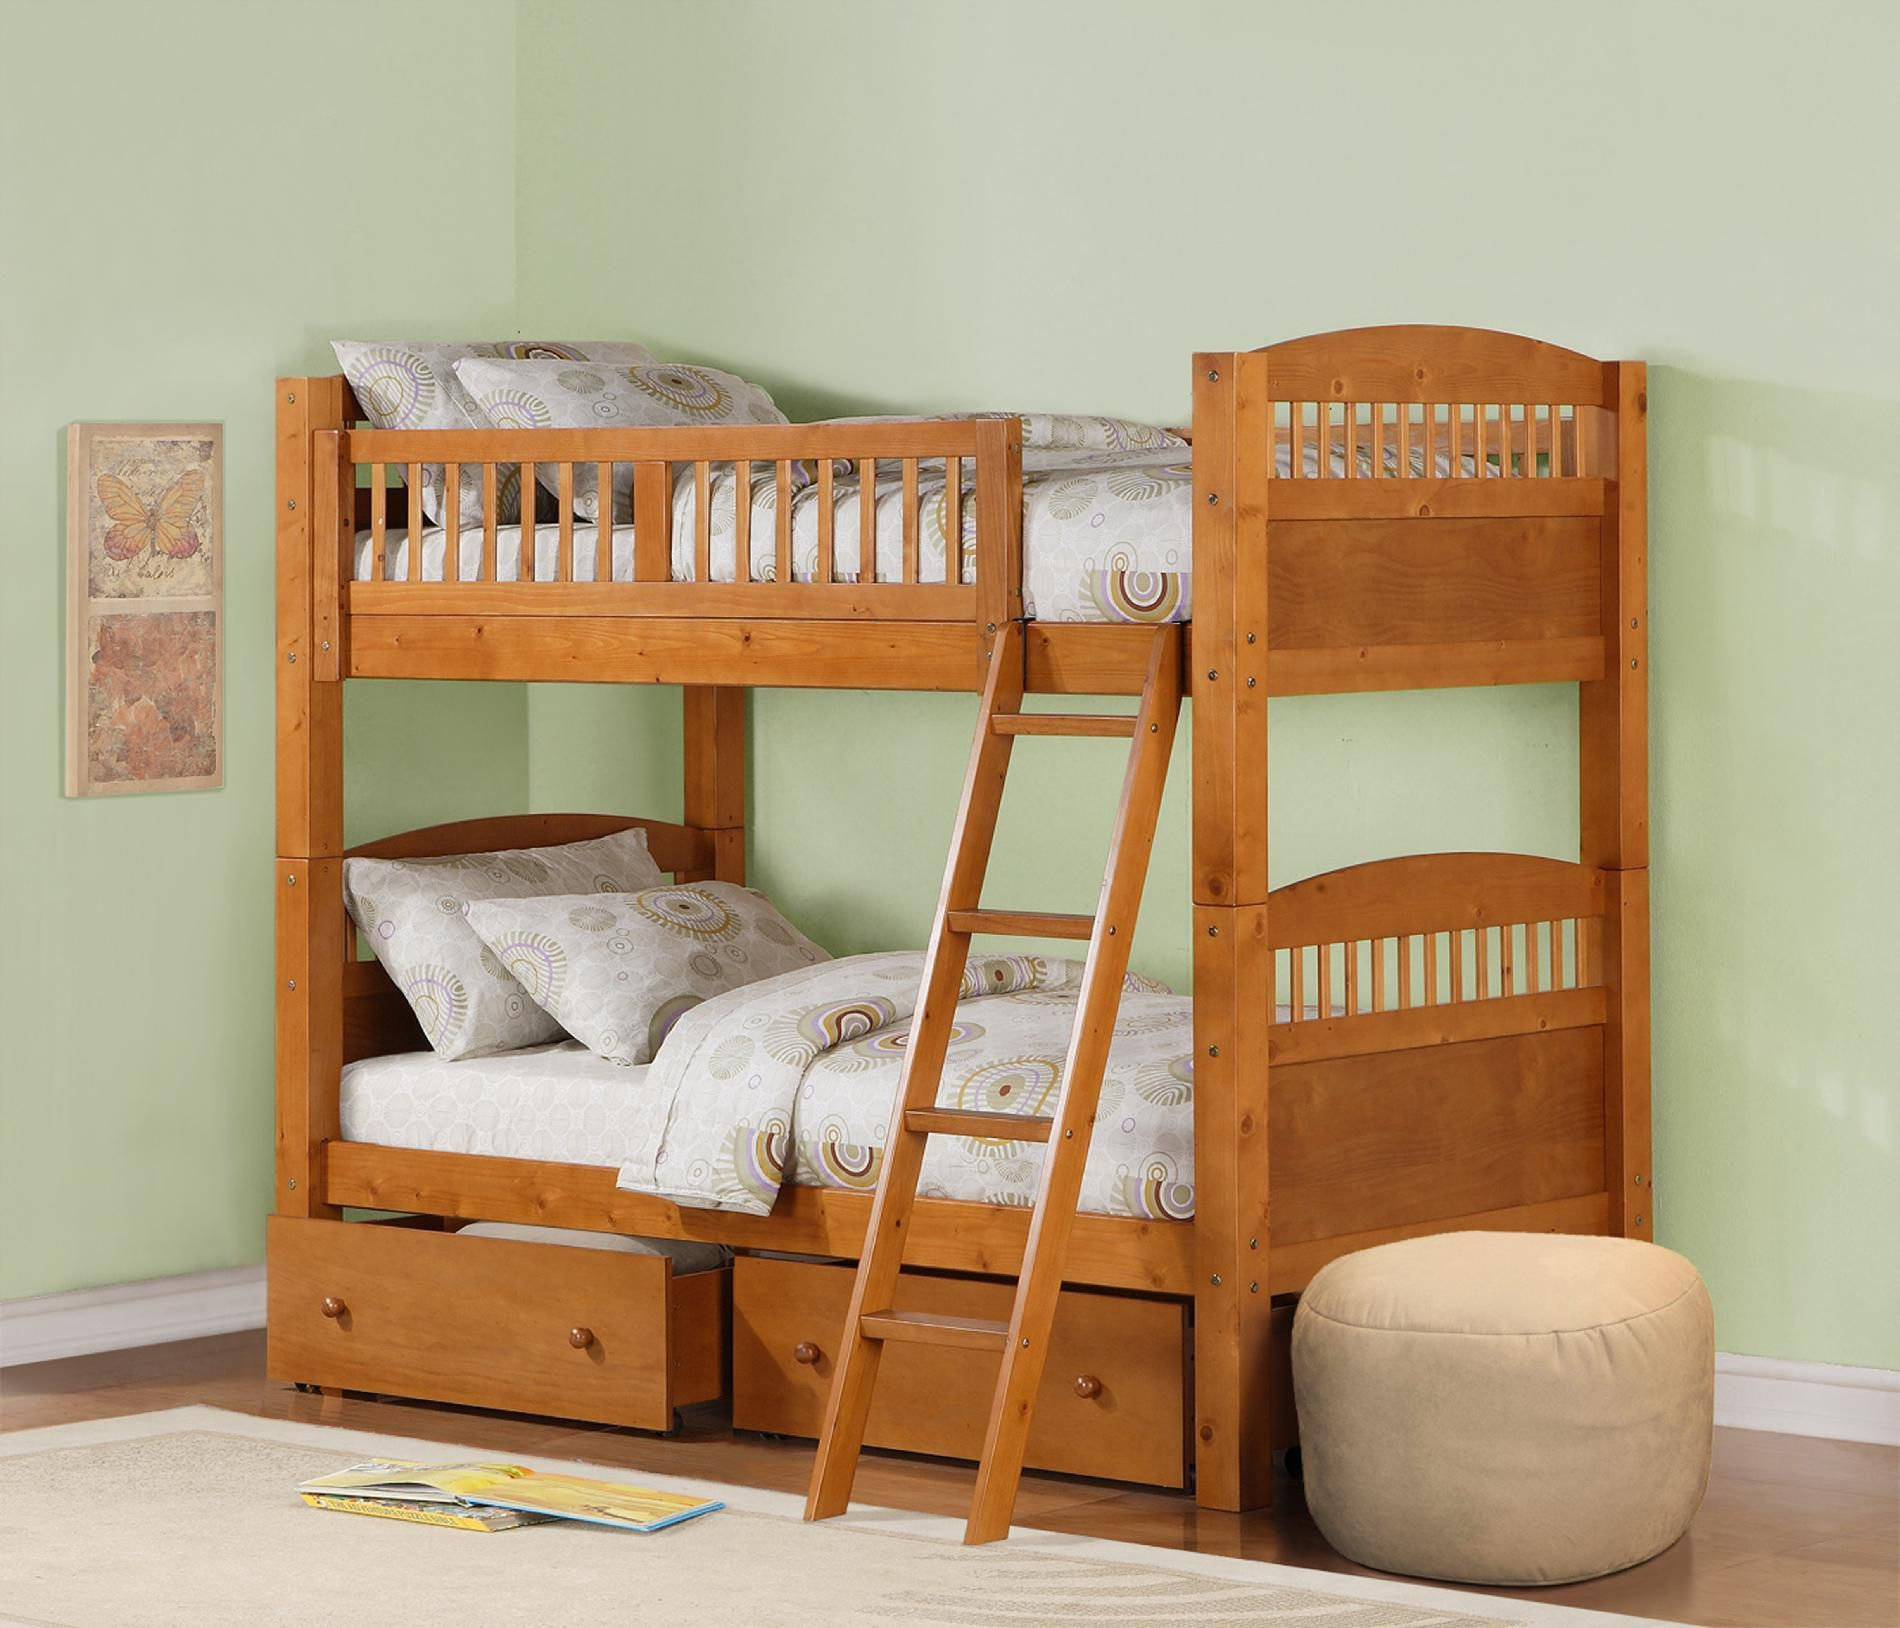 Pine Bunk Bed Sleep Well With Sears